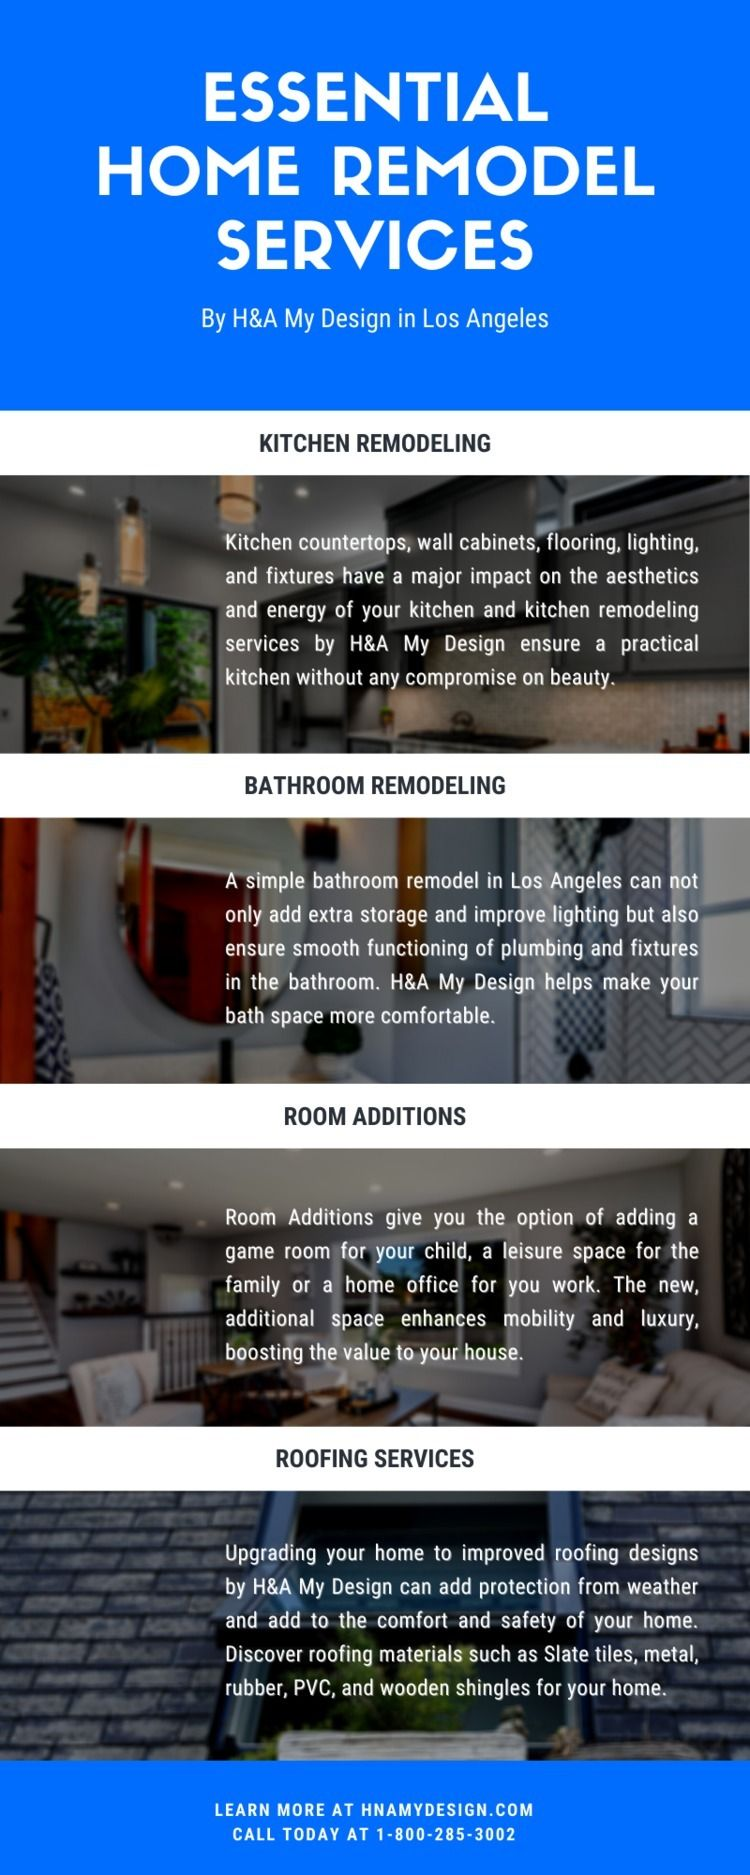 Essential Home Remodel Services - handamydesign | ello